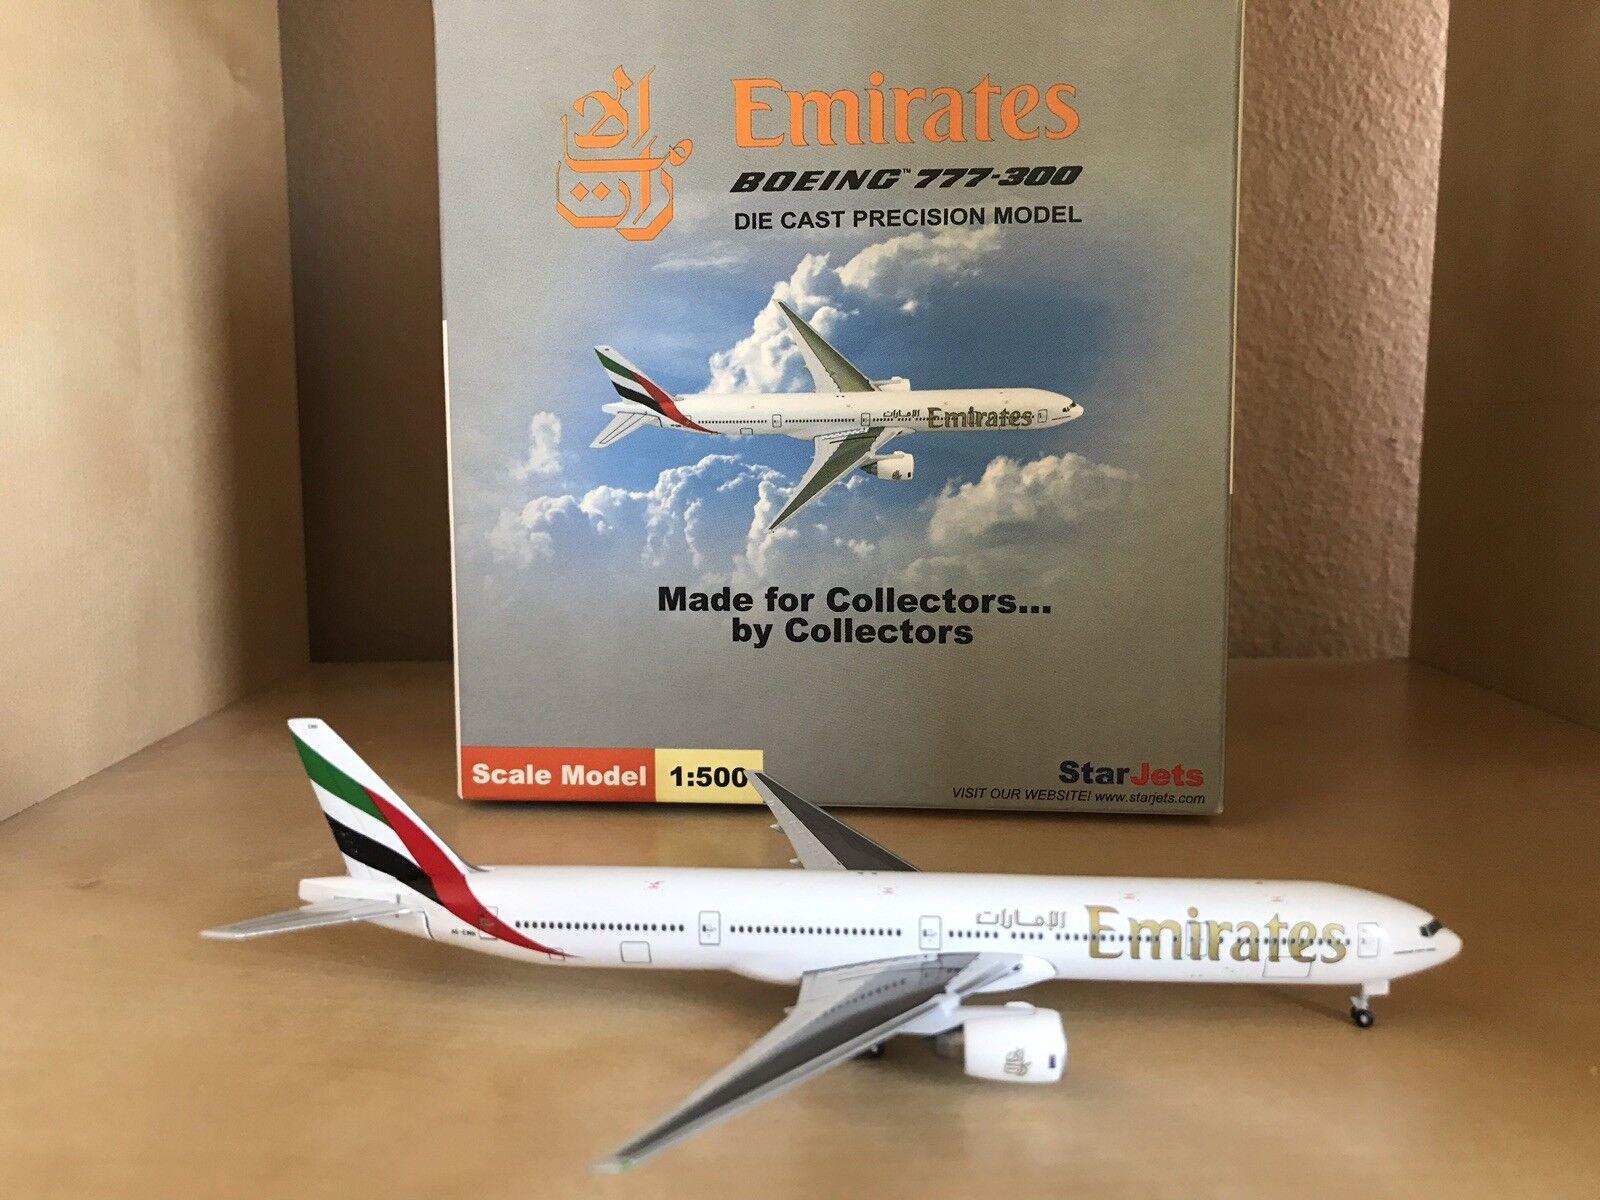 Emirates Boeing 777-300 1 500 Escala Modelo Por EstrellaJets